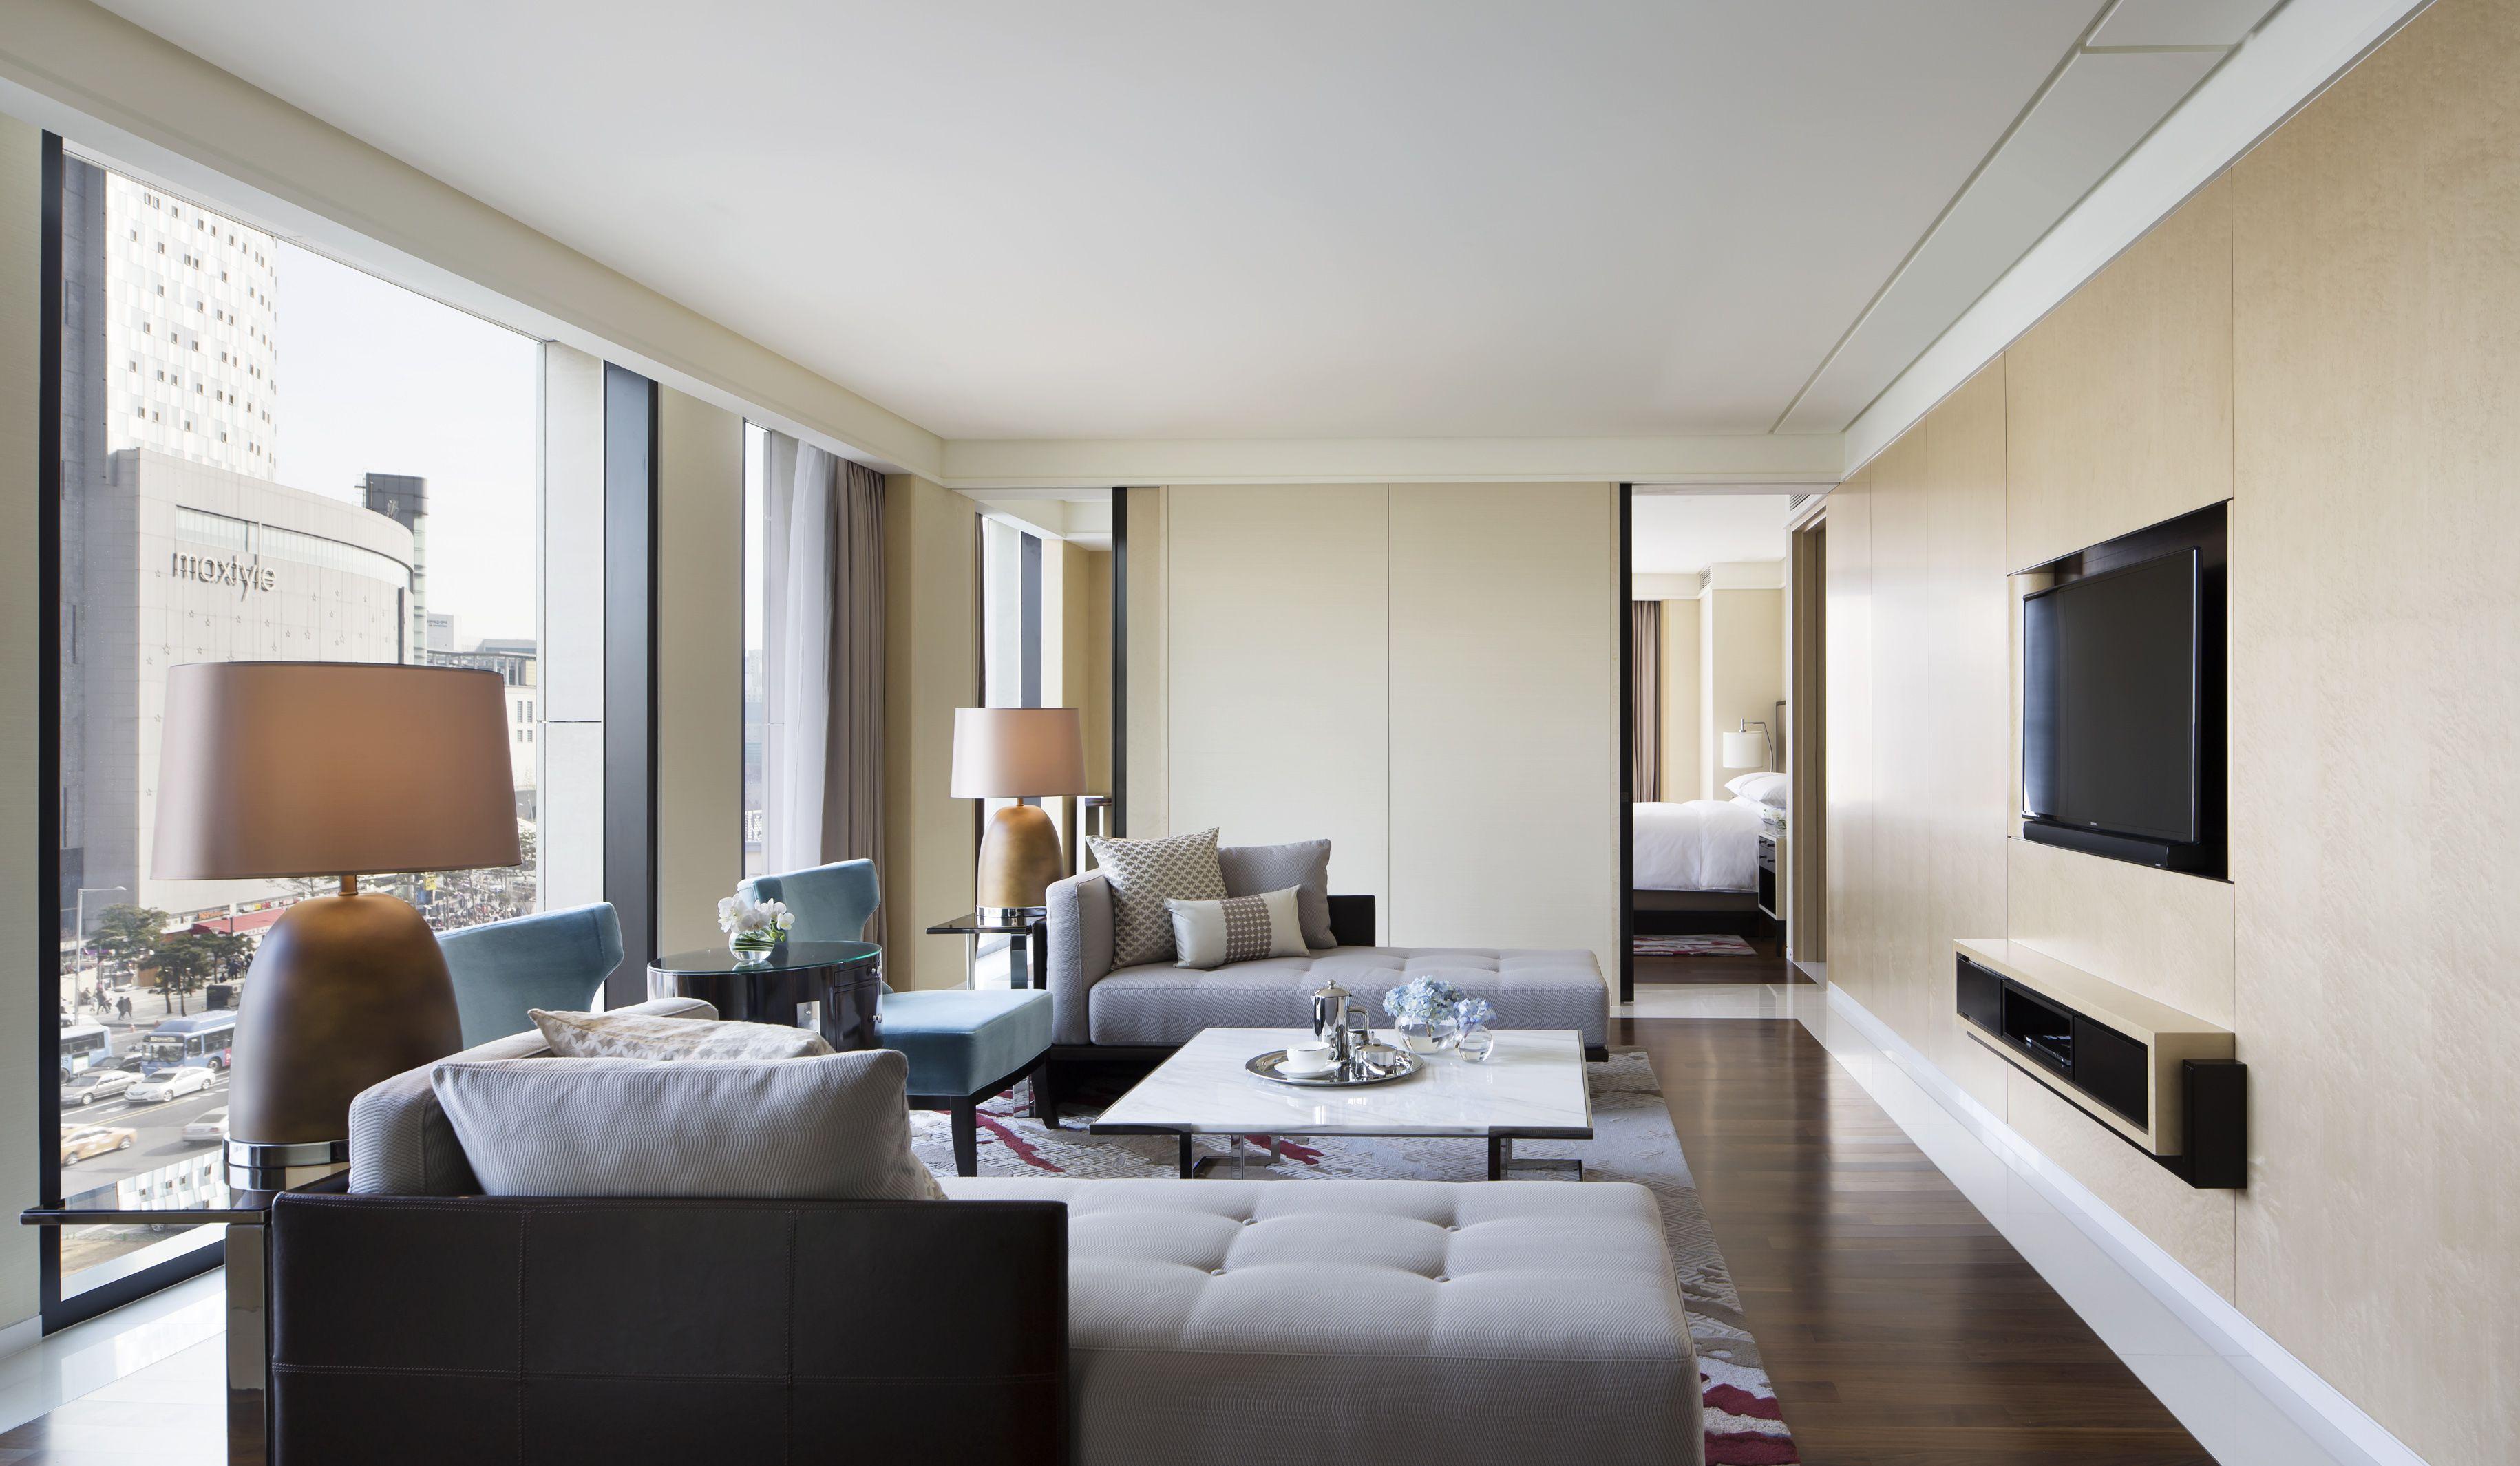 [JW MDSS]_Executive Deluxe Room_1 Hotel suite luxury